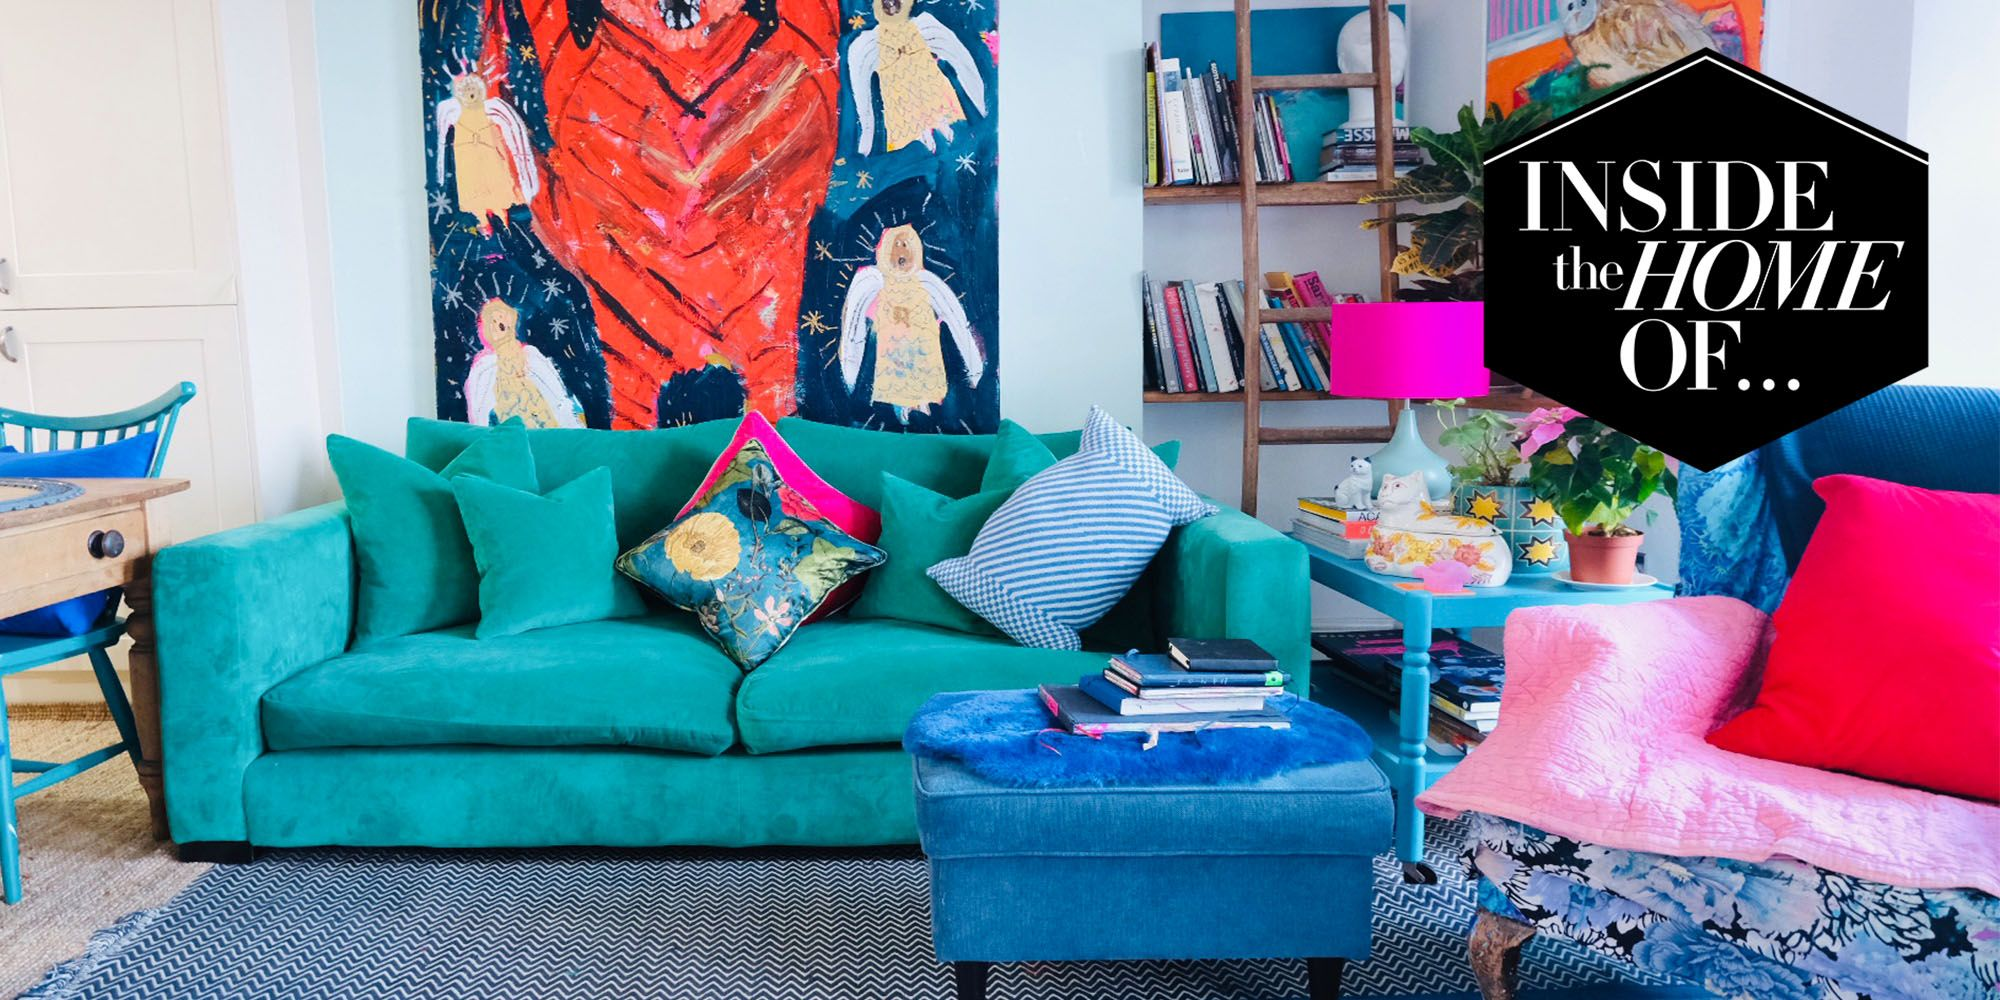 Inside the home of... artist Emily Powell